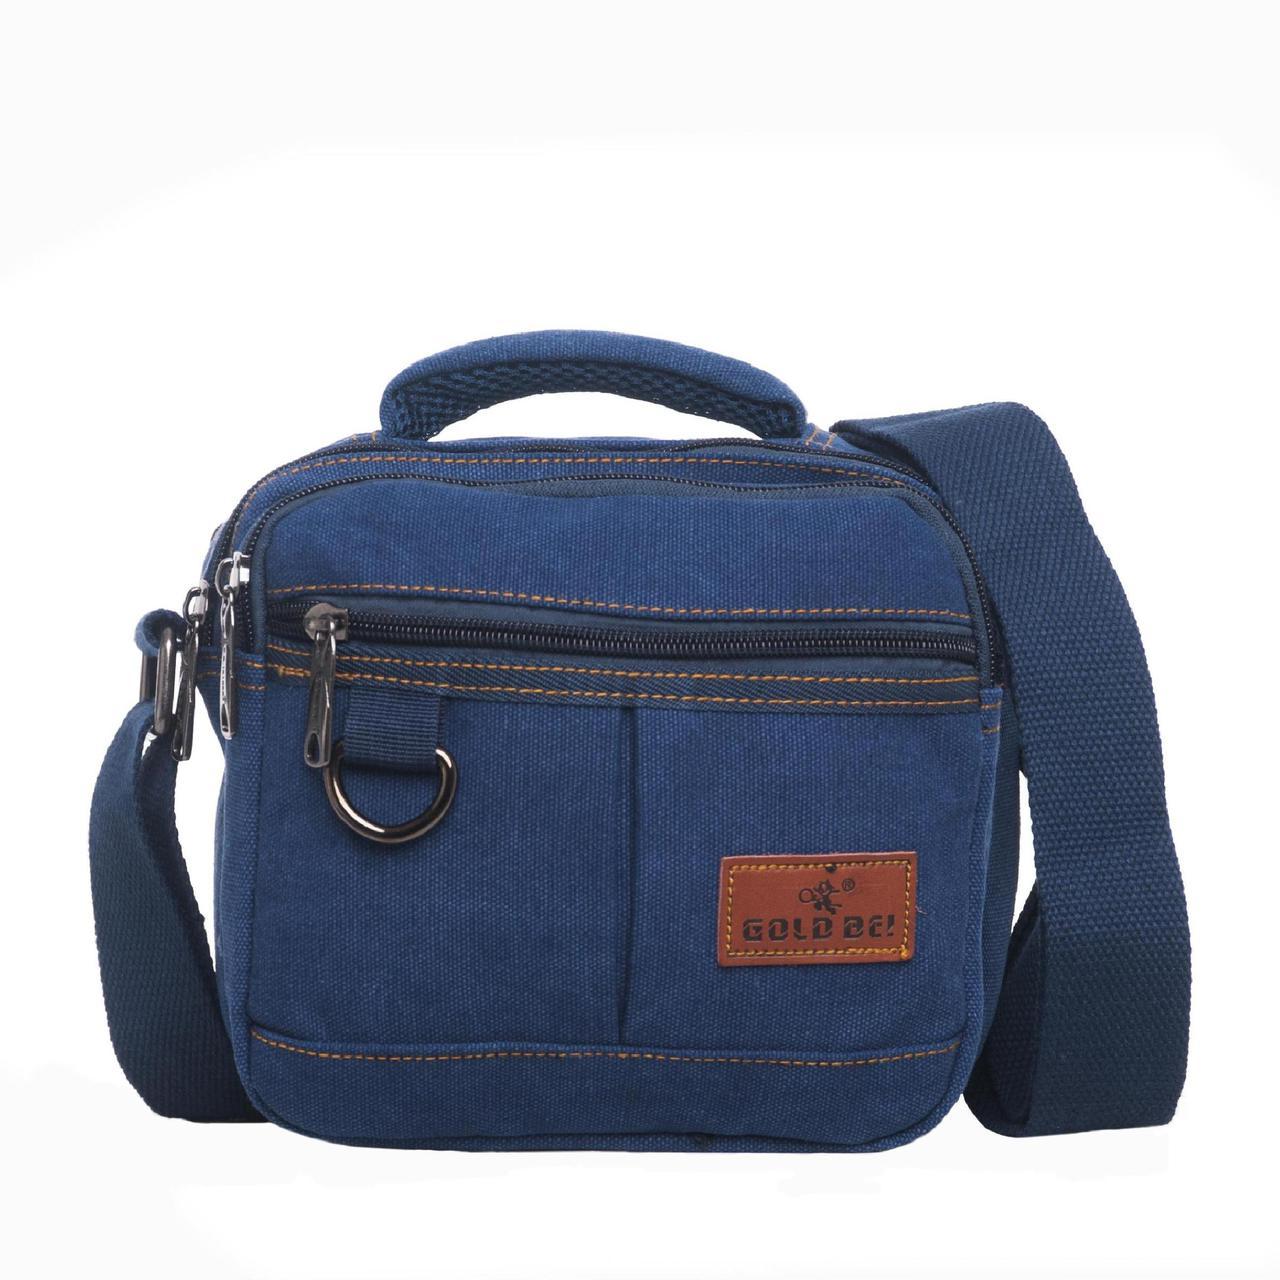 Чоловіча сумка горизонтальна GOLD BE 20х21х12 синя тканина брезент ксС999син